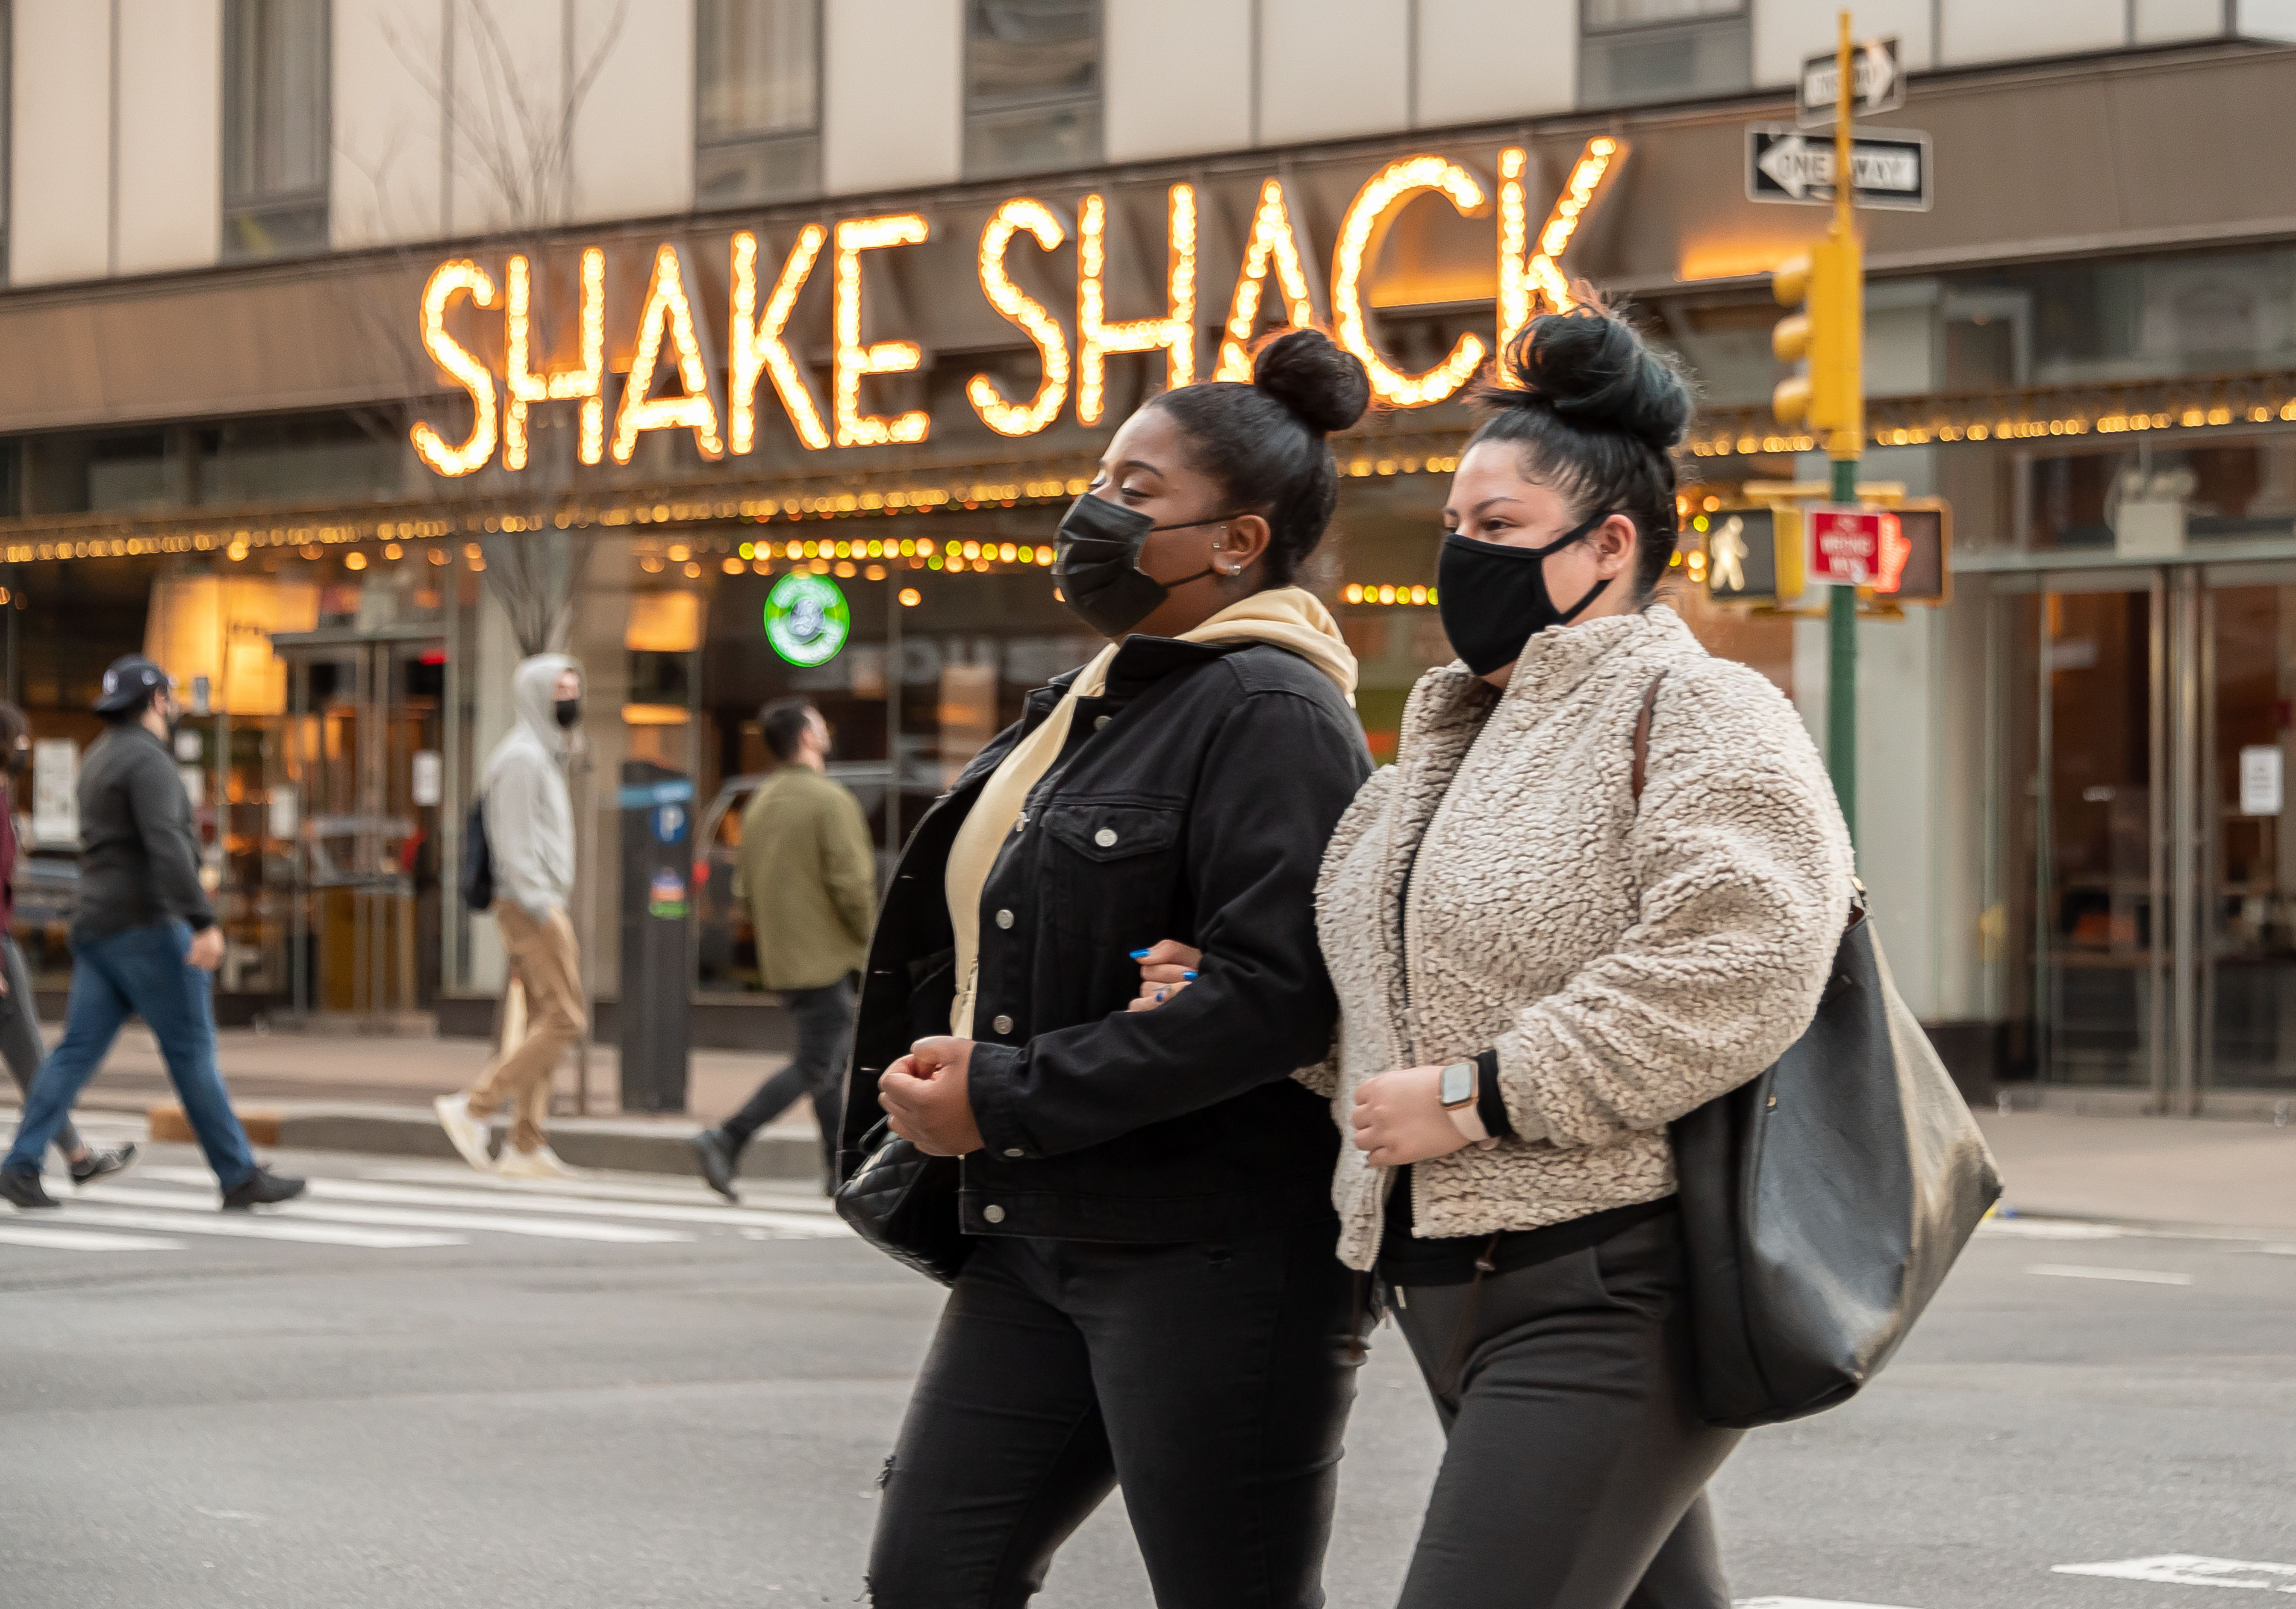 A Shake Shack storefront